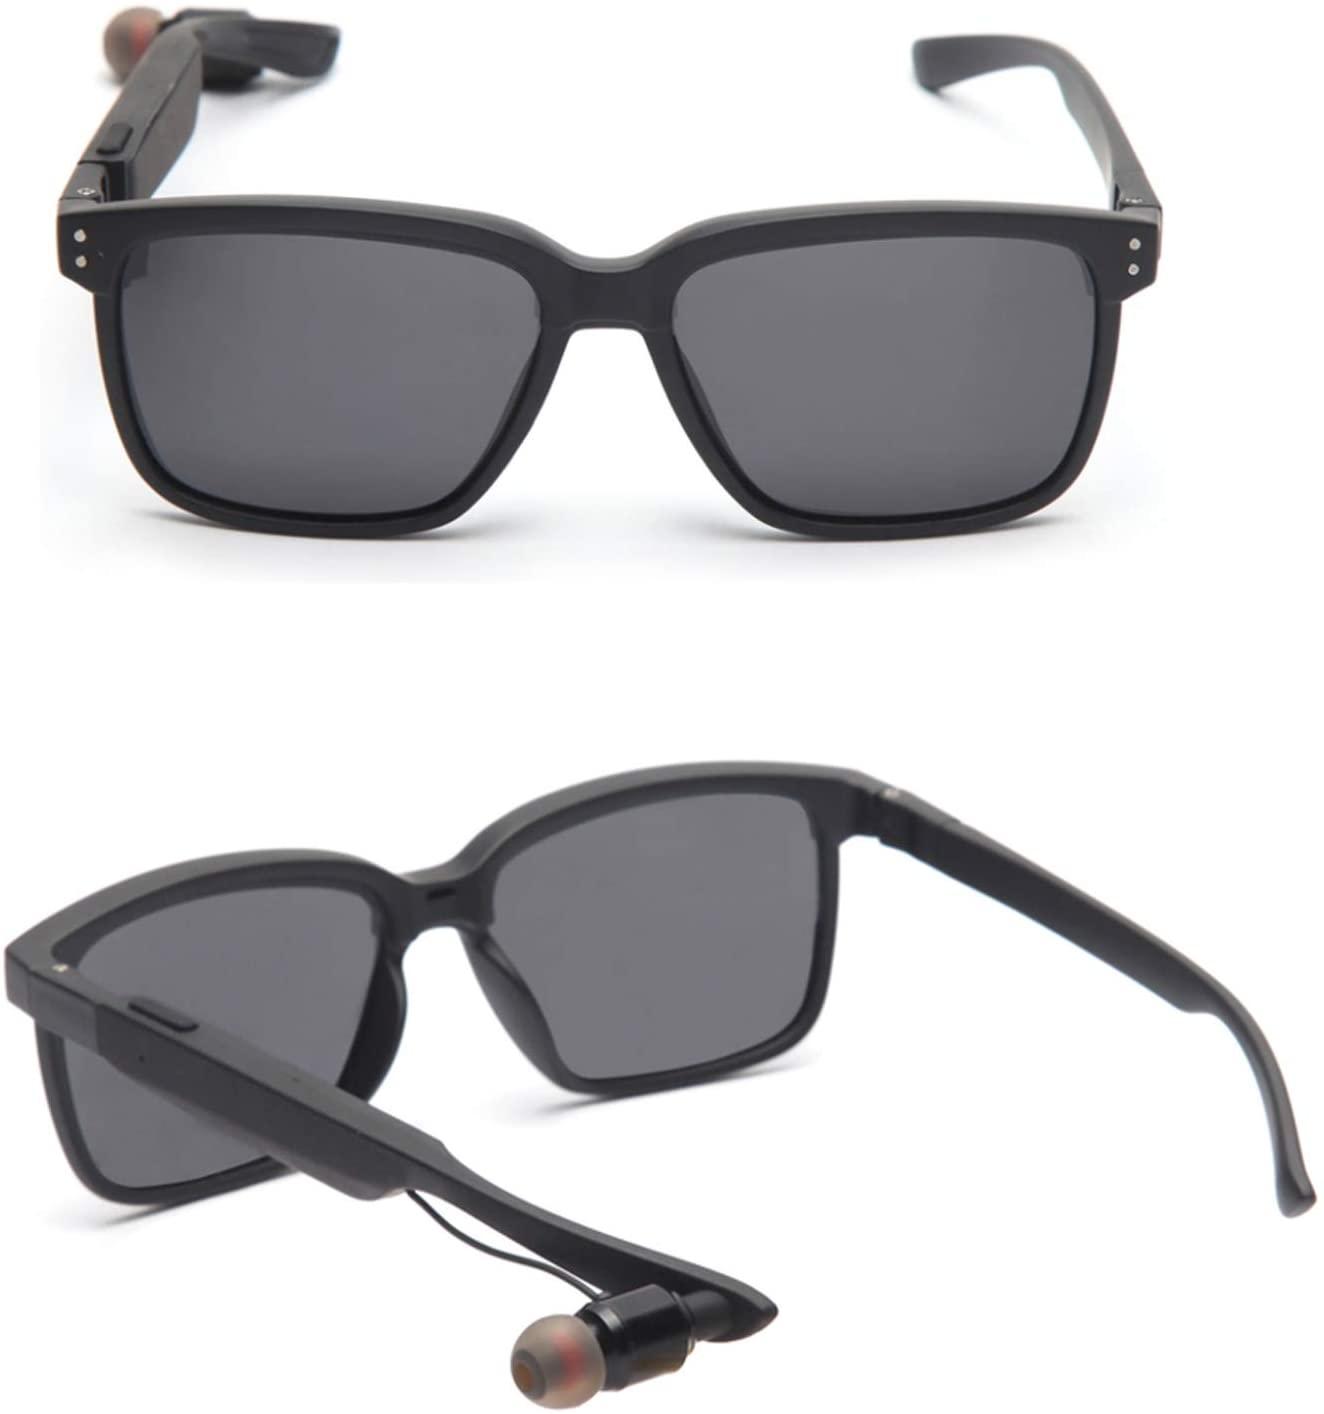 Sunglasses Wireless Headset 2